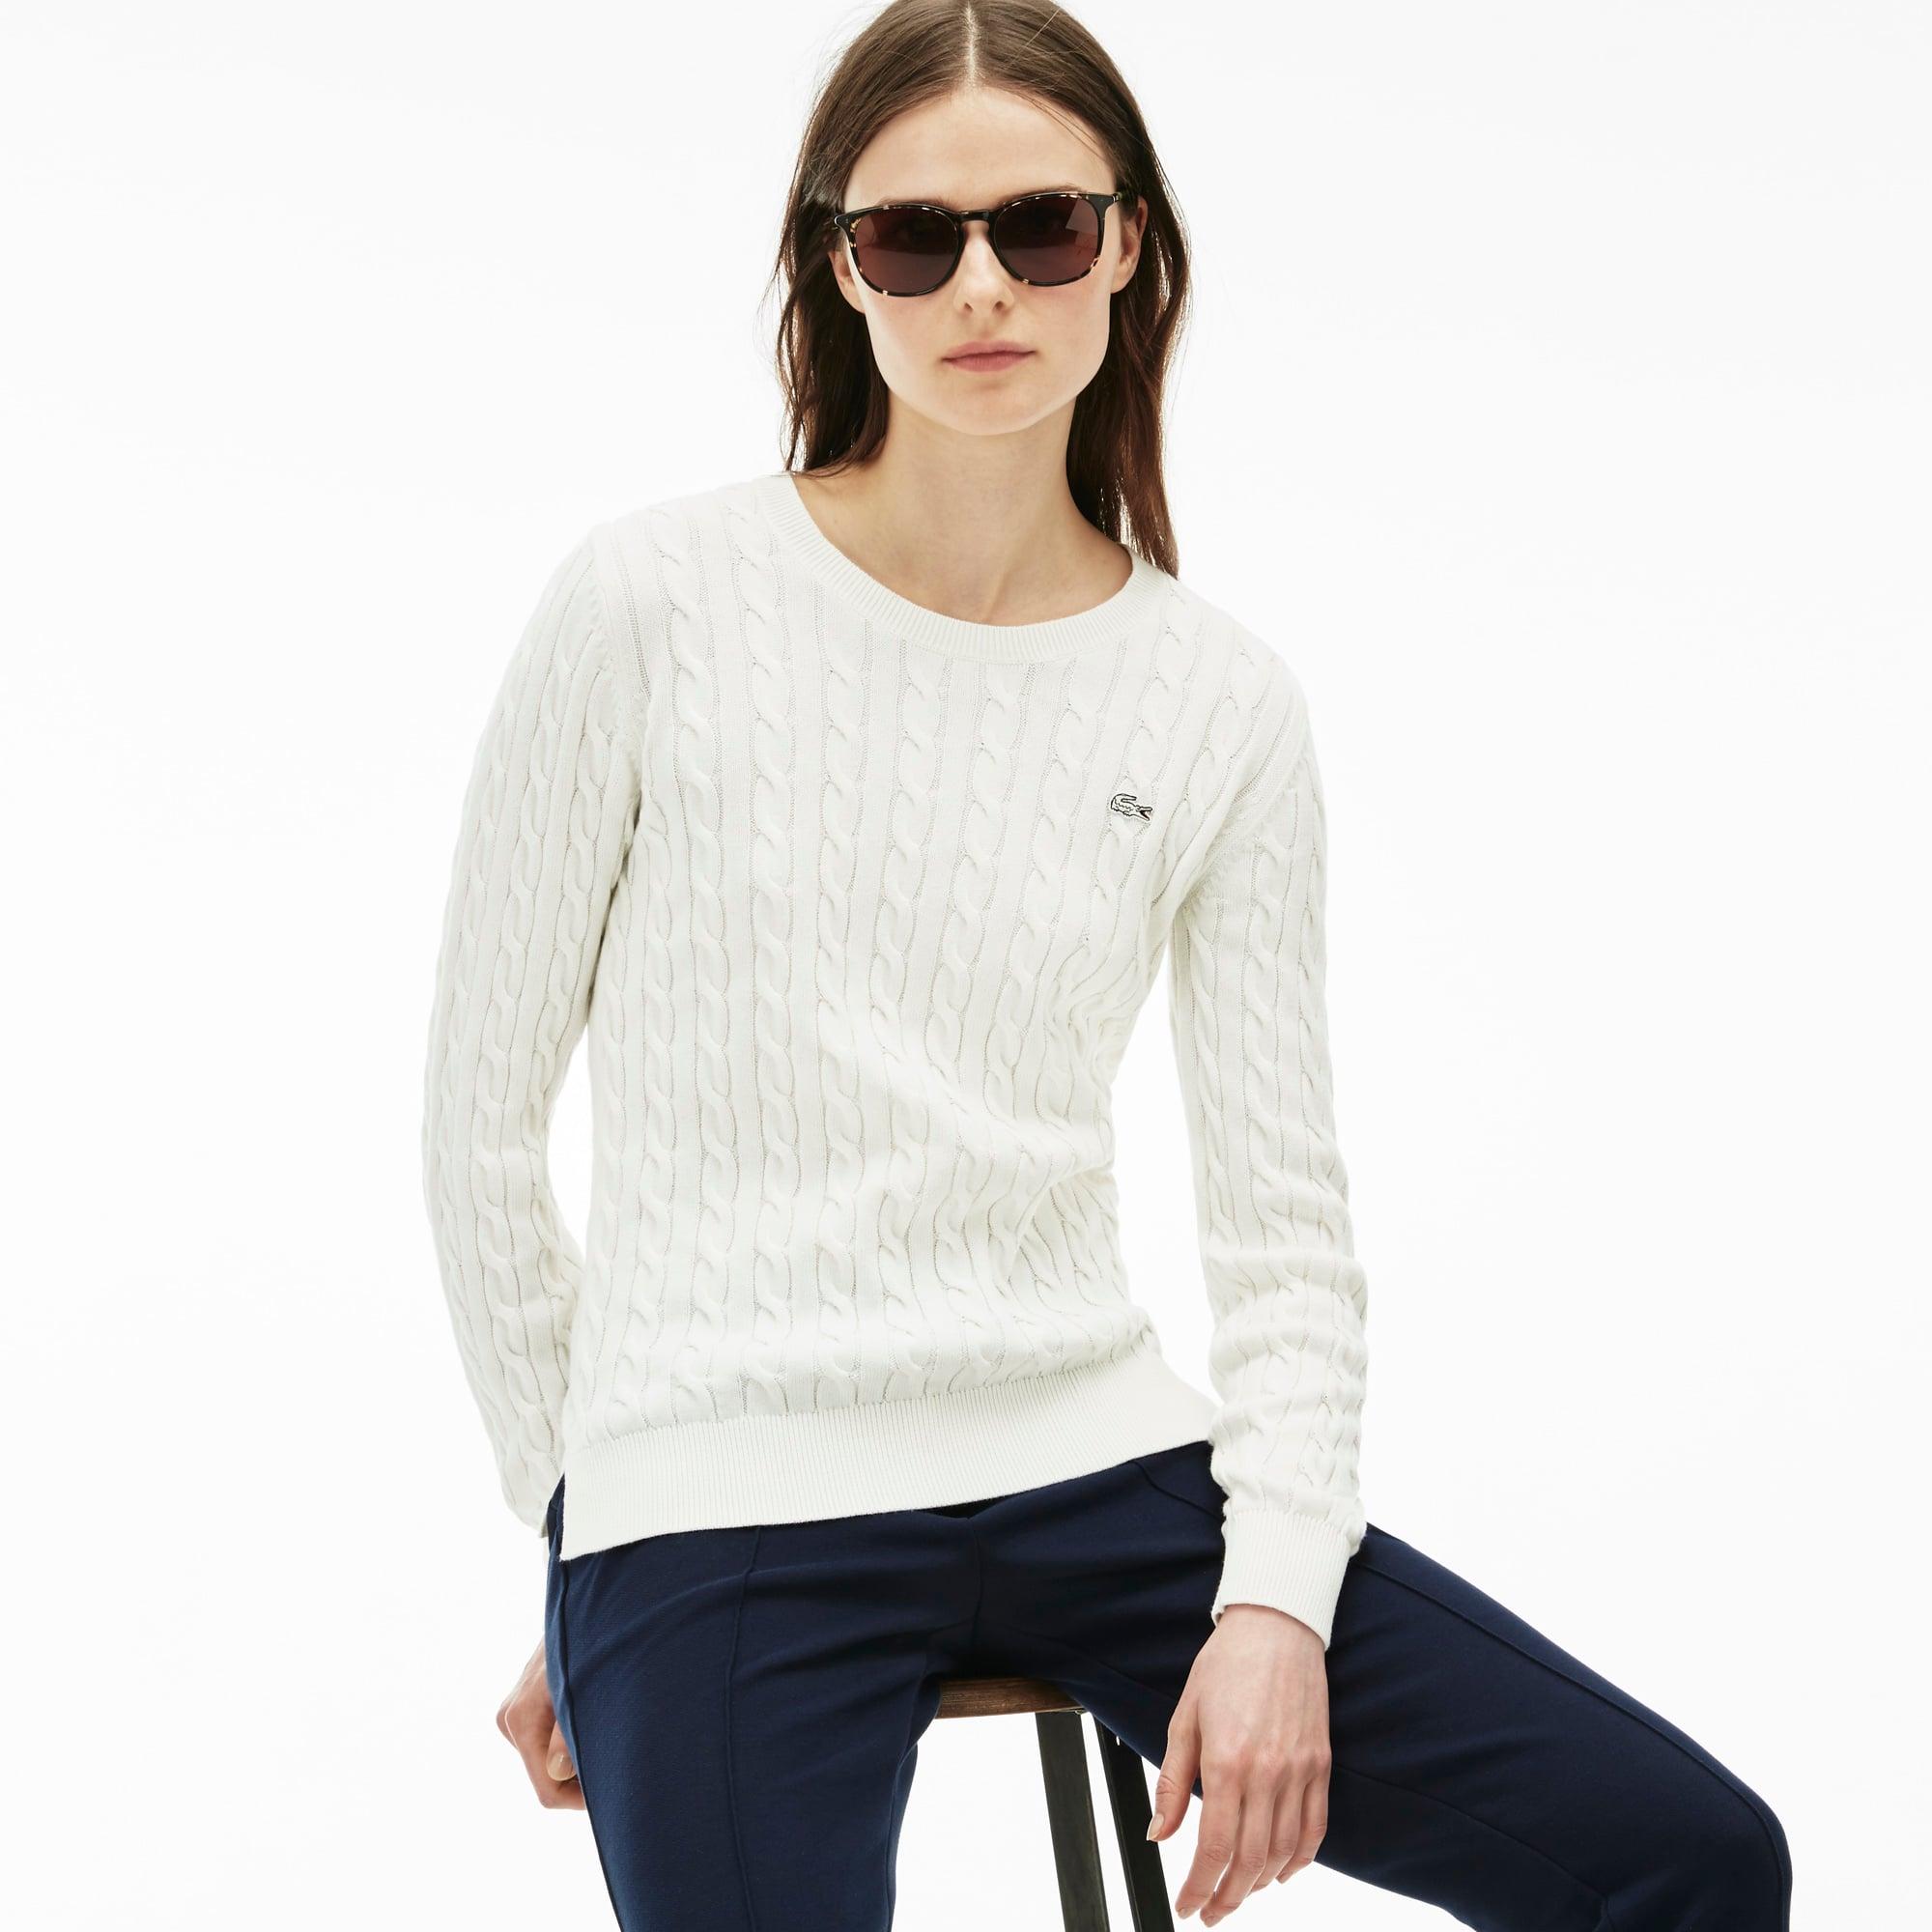 Women's Cotton Cable Knit Crewneck Sweater